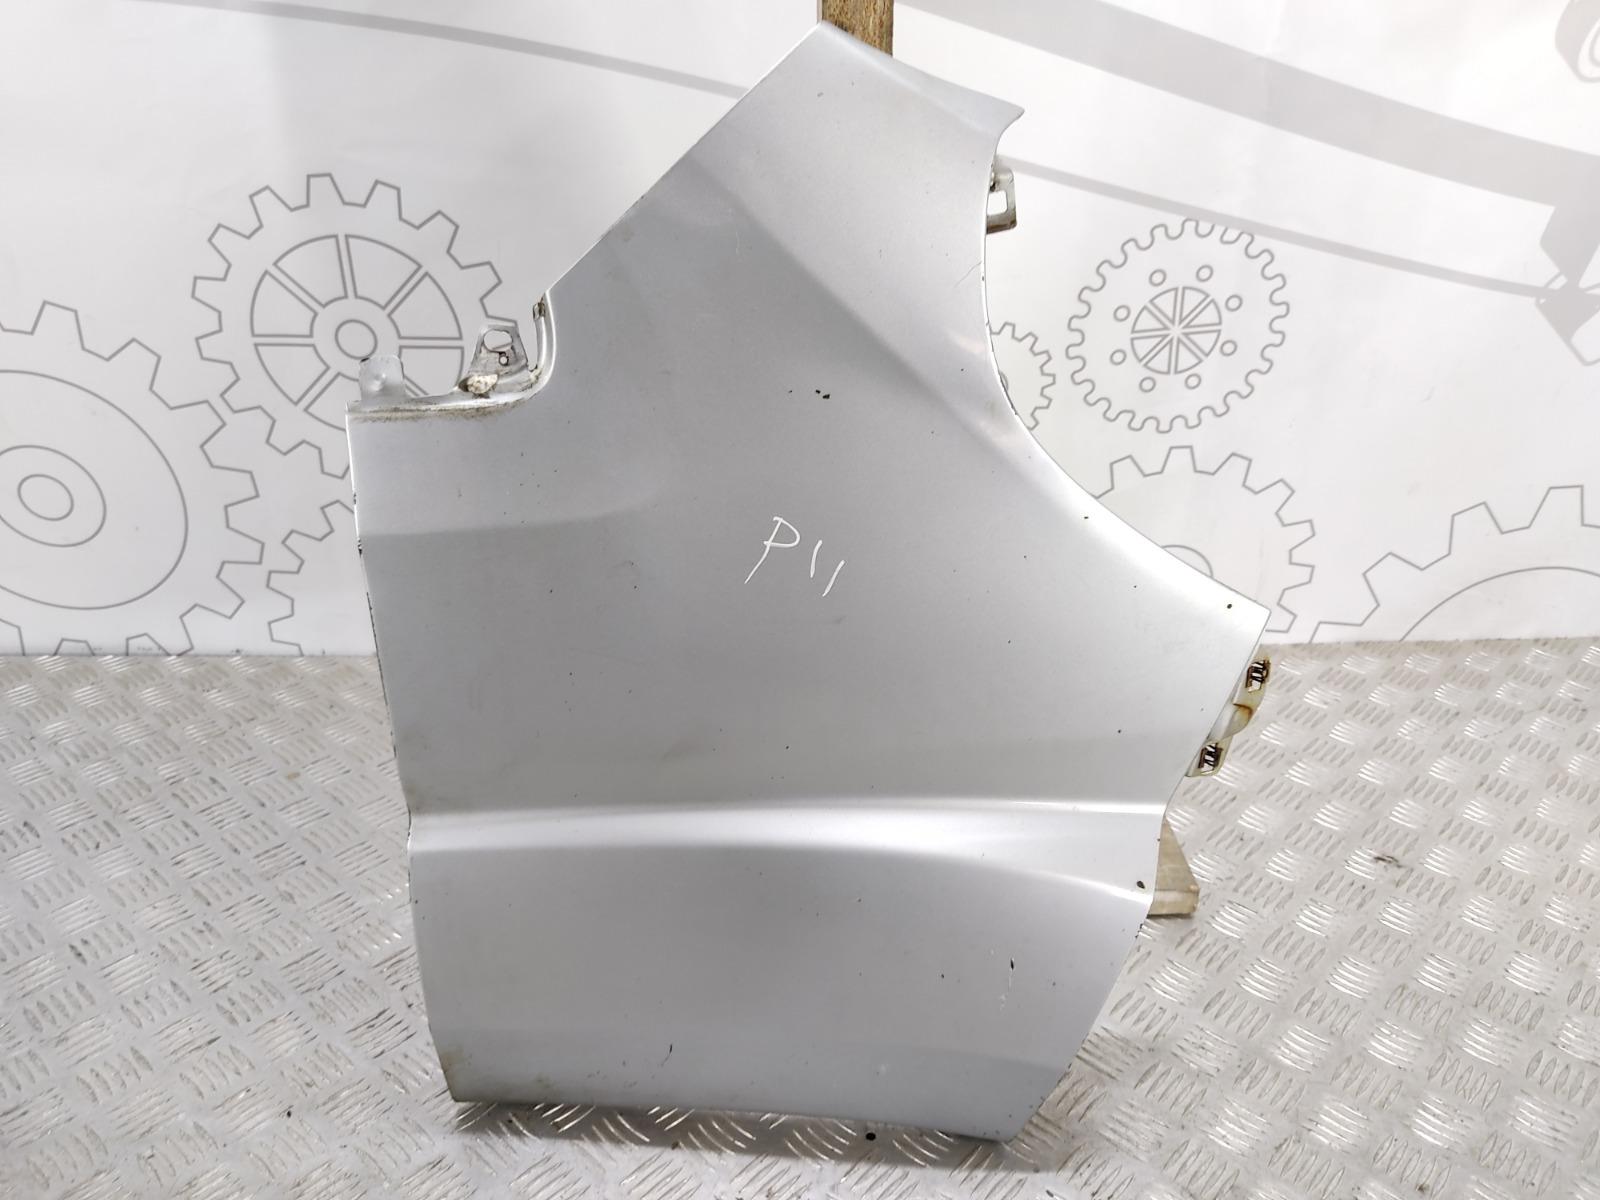 Крыло переднее правое Citroen Jumper 2.2 HDI 2013 (б/у)